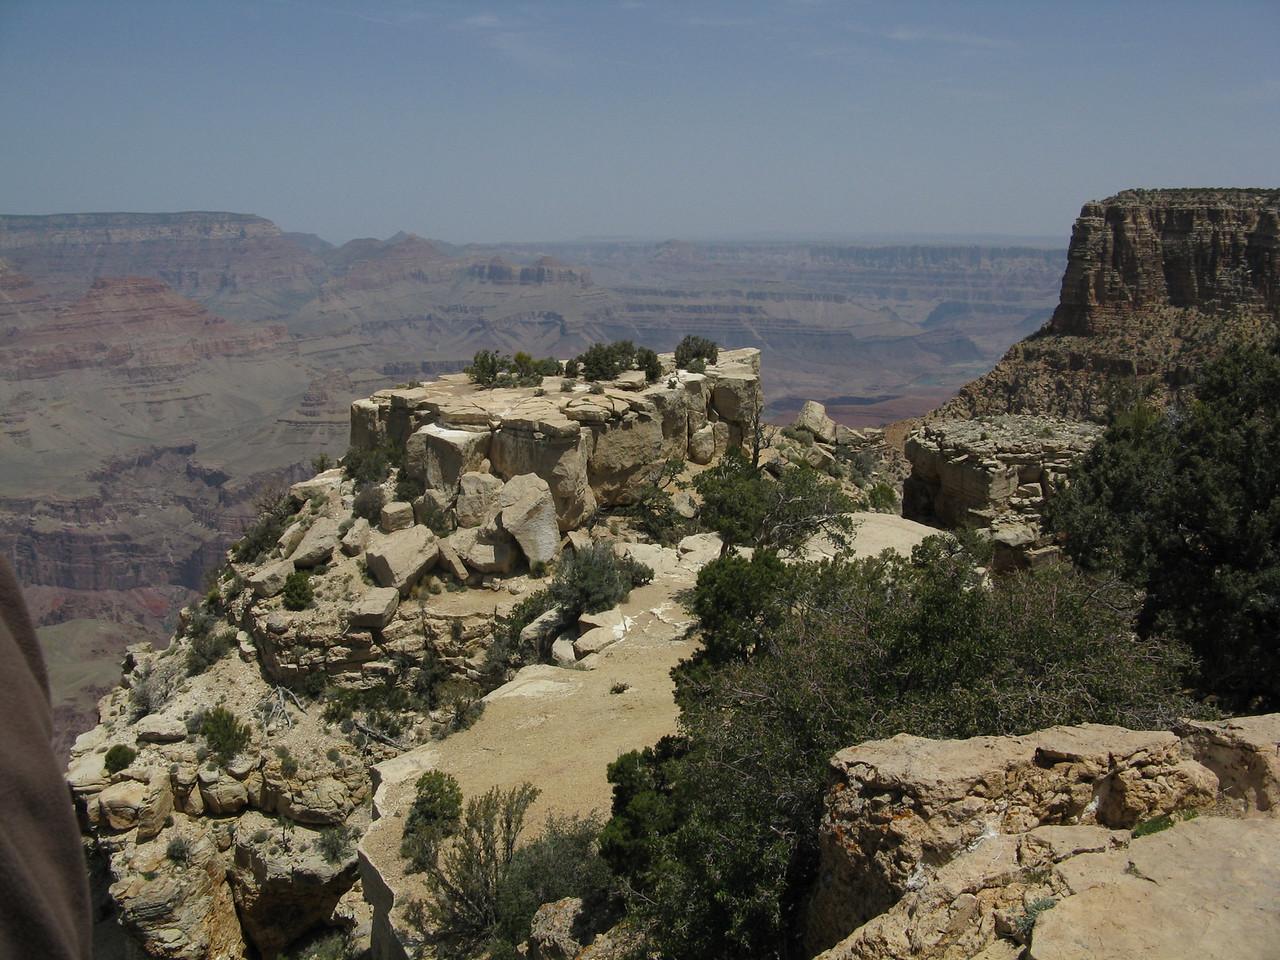 The rocks along the rim are beautiful.